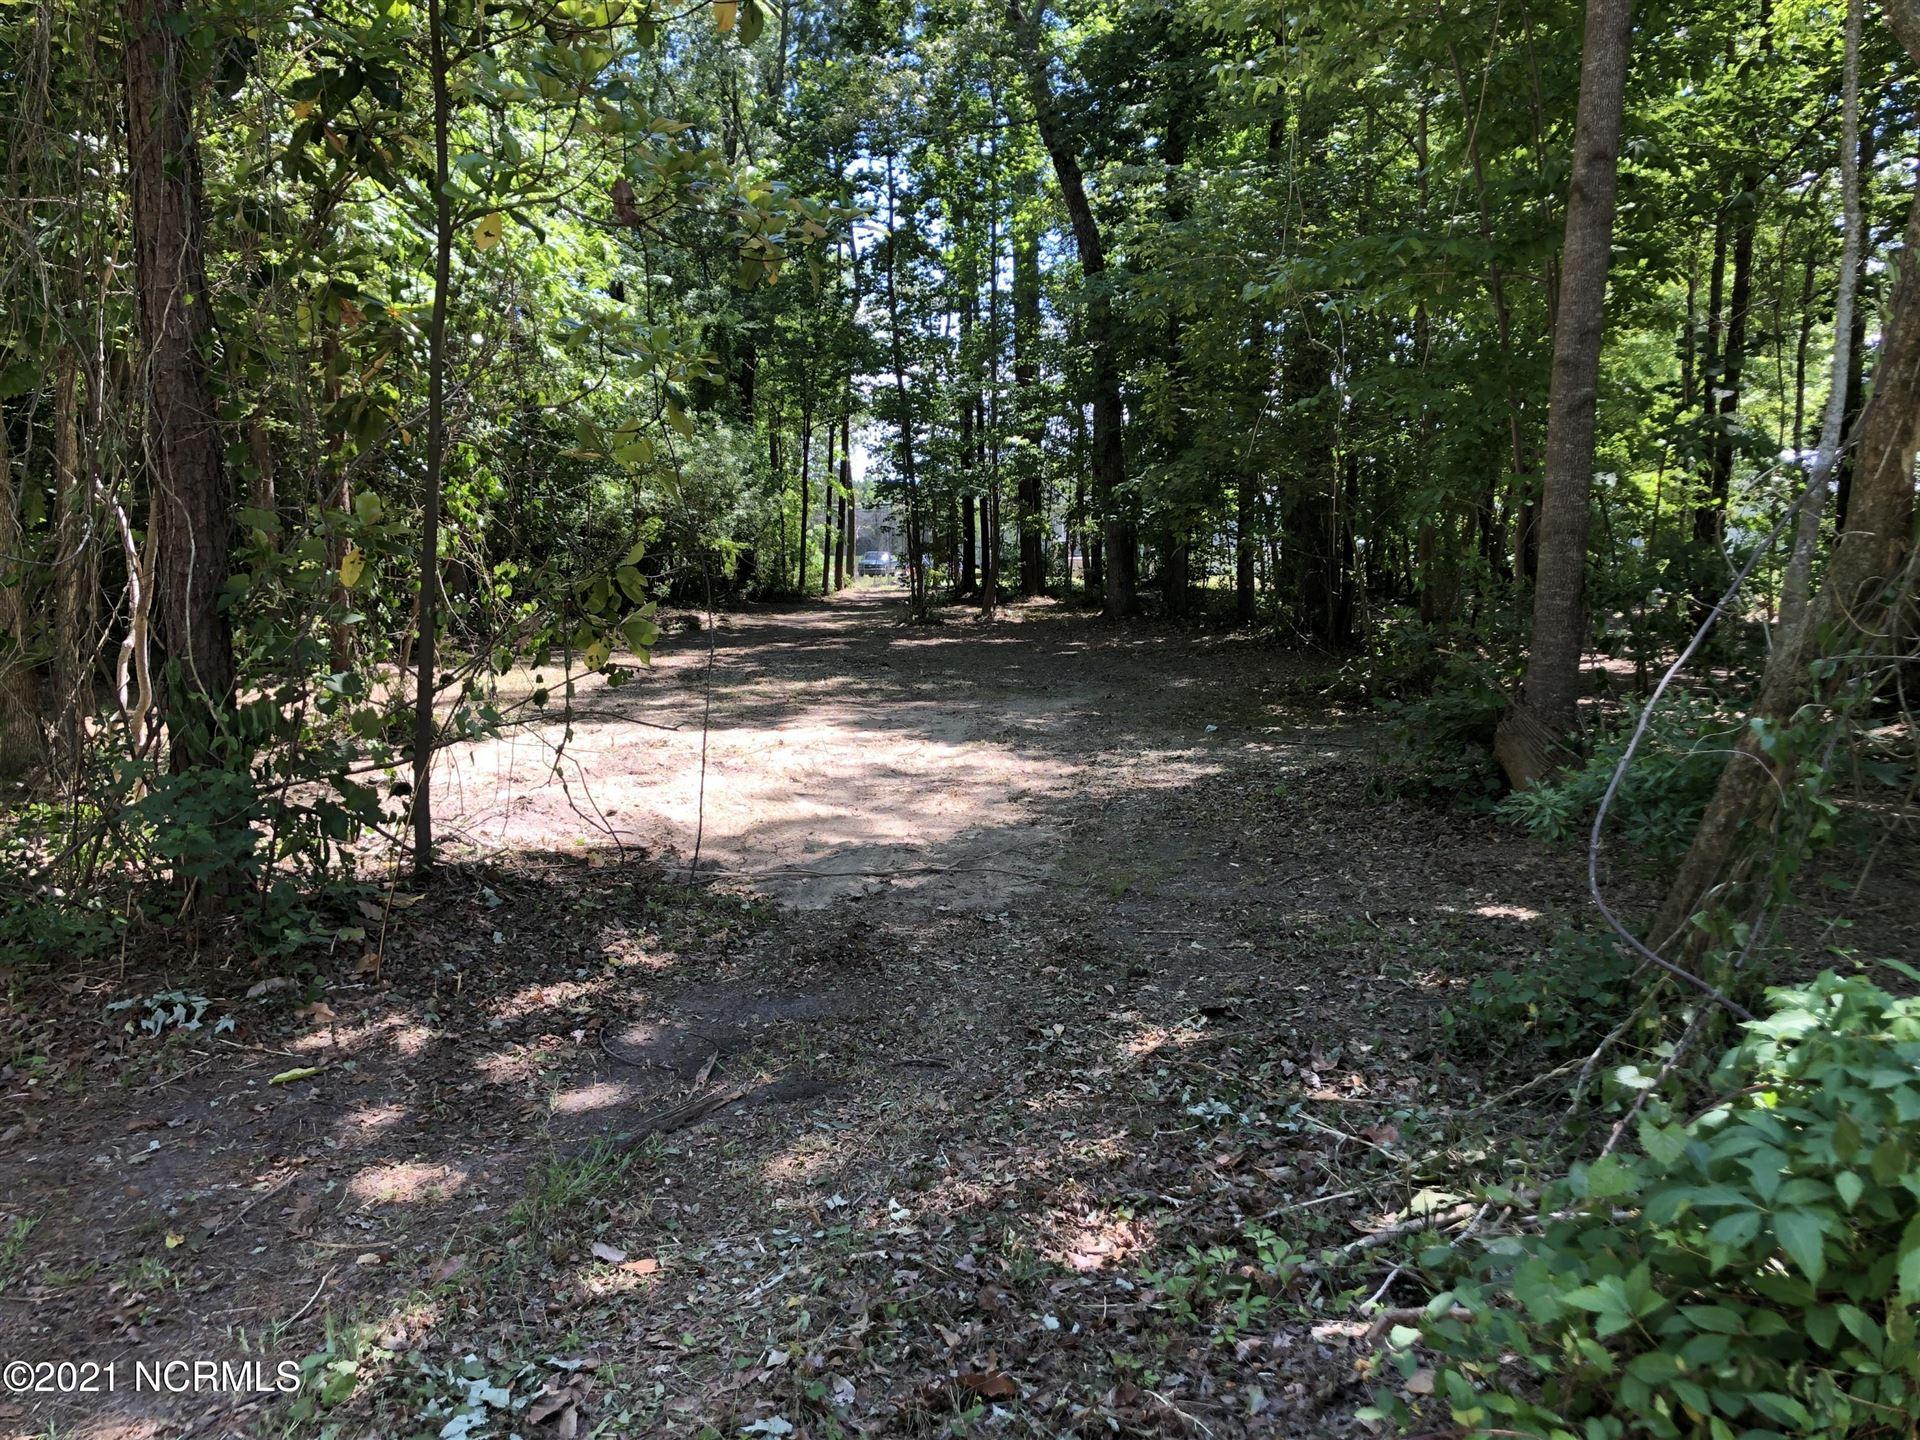 Photo of Lot 6 Glebe Creek Landing Road, Bath, NC 27808 (MLS # 100189825)